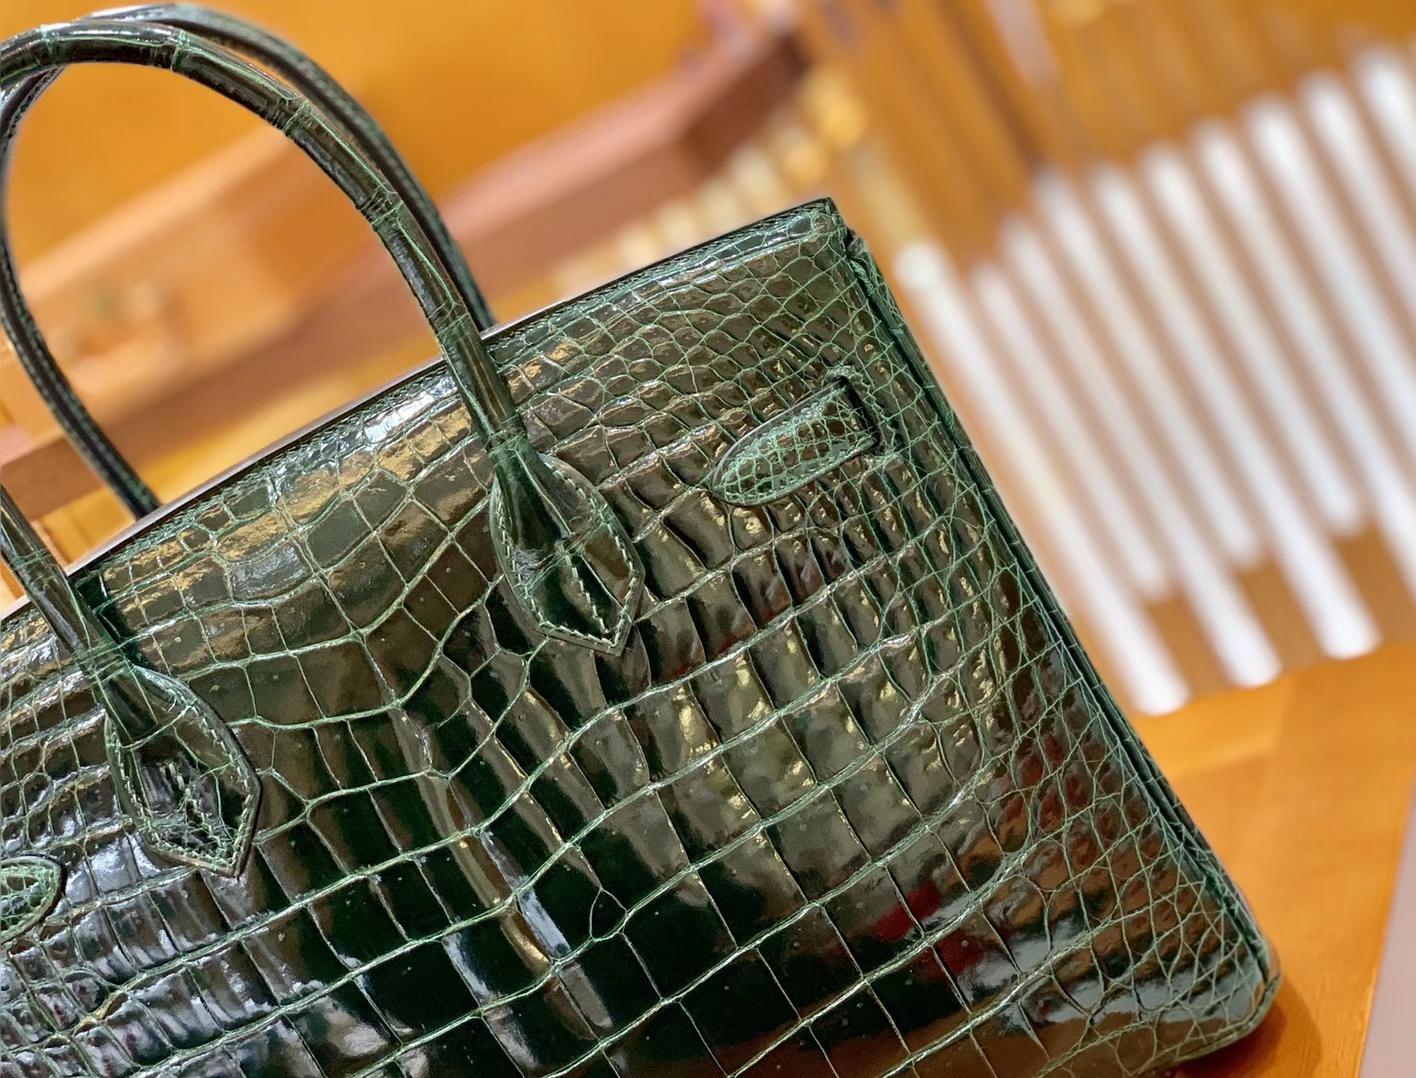 Hermès(爱马仕)Birkin 30cm 祖母绿 金扣 一级皮湾鳄鱼皮 臻品级别